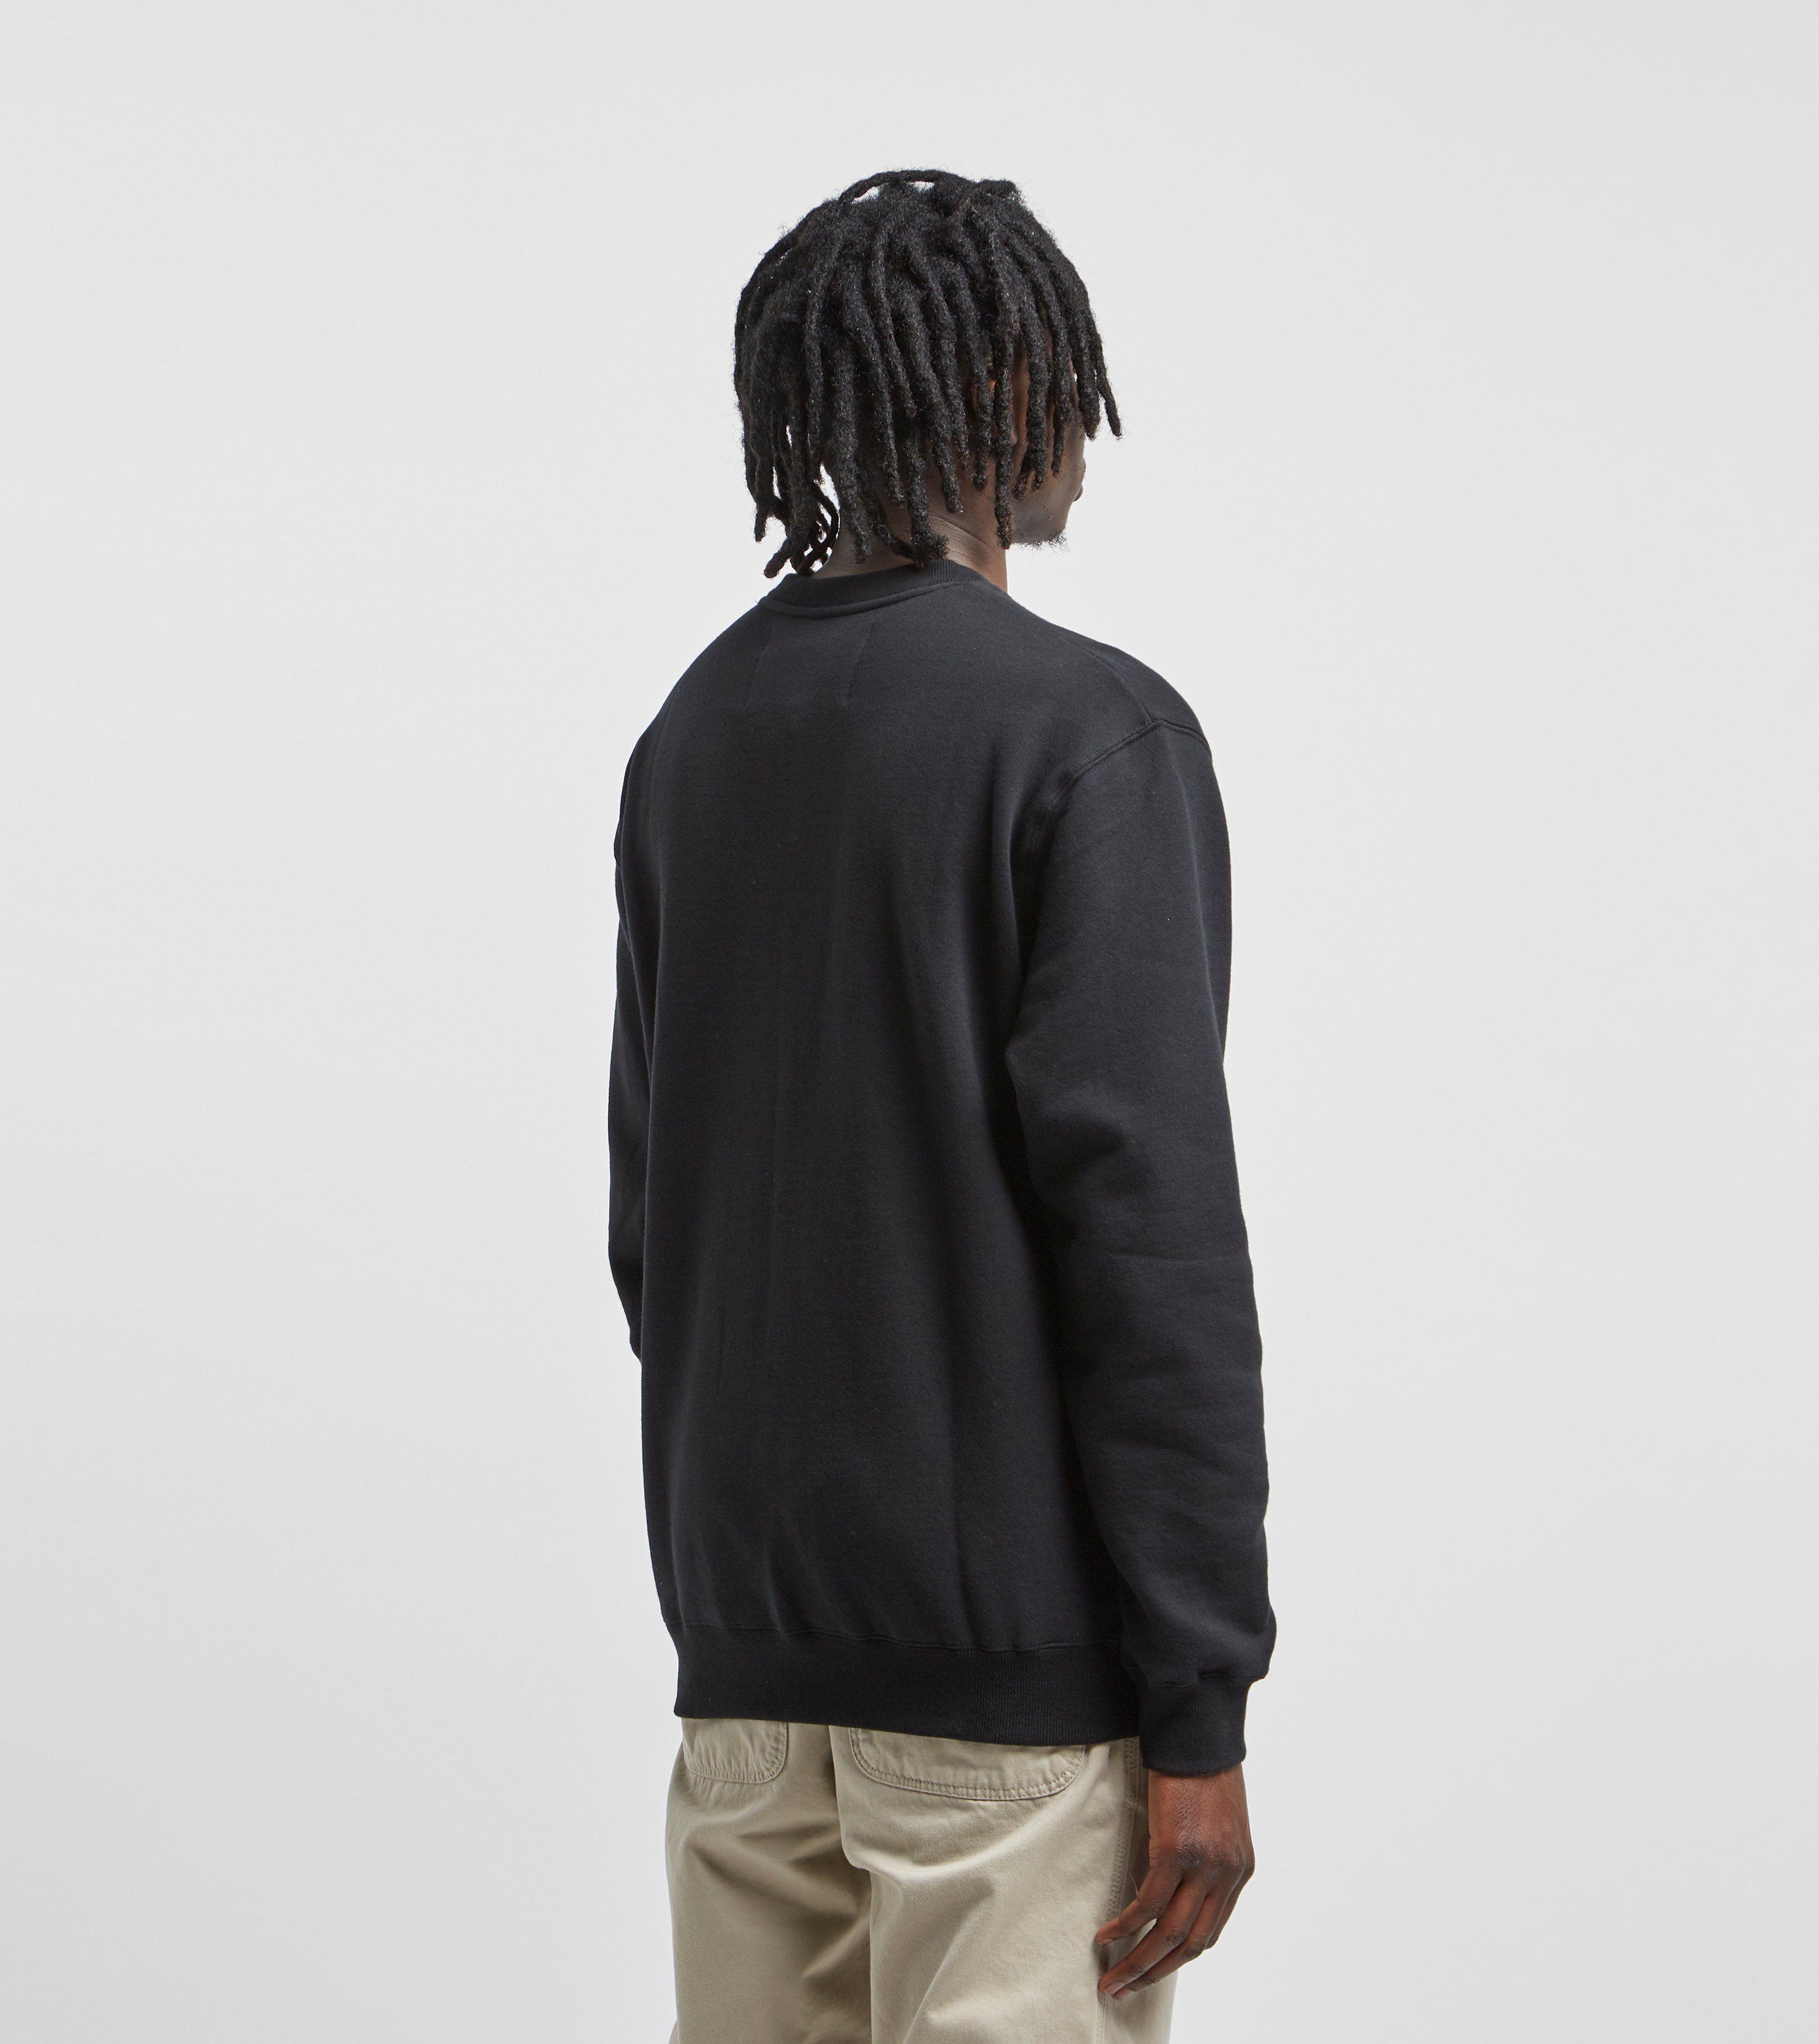 PIILGRIM Saturn Sweatshirt